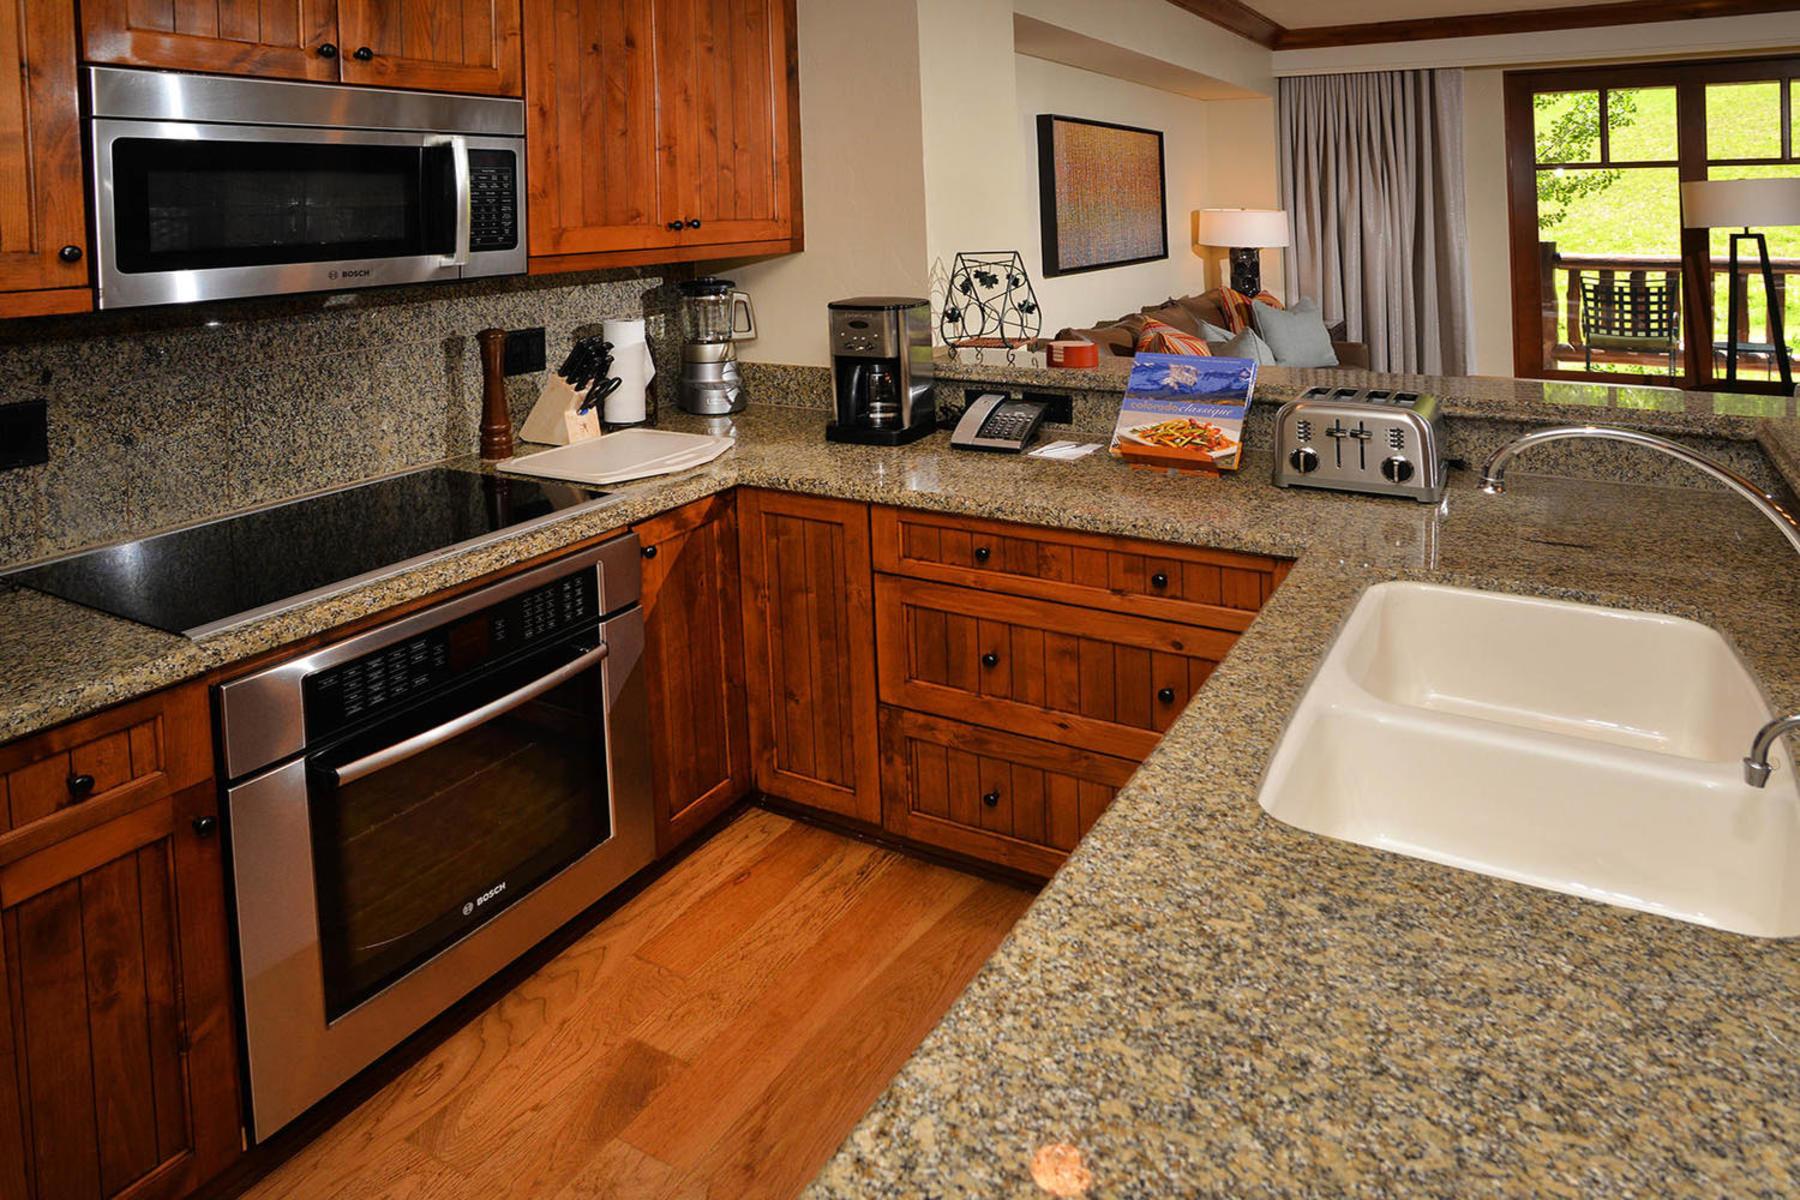 Additional photo for property listing at Timbers Bachelor 3604-03 100 Bachelor #3604-03 Beaver Creek, Colorado 81620 Estados Unidos